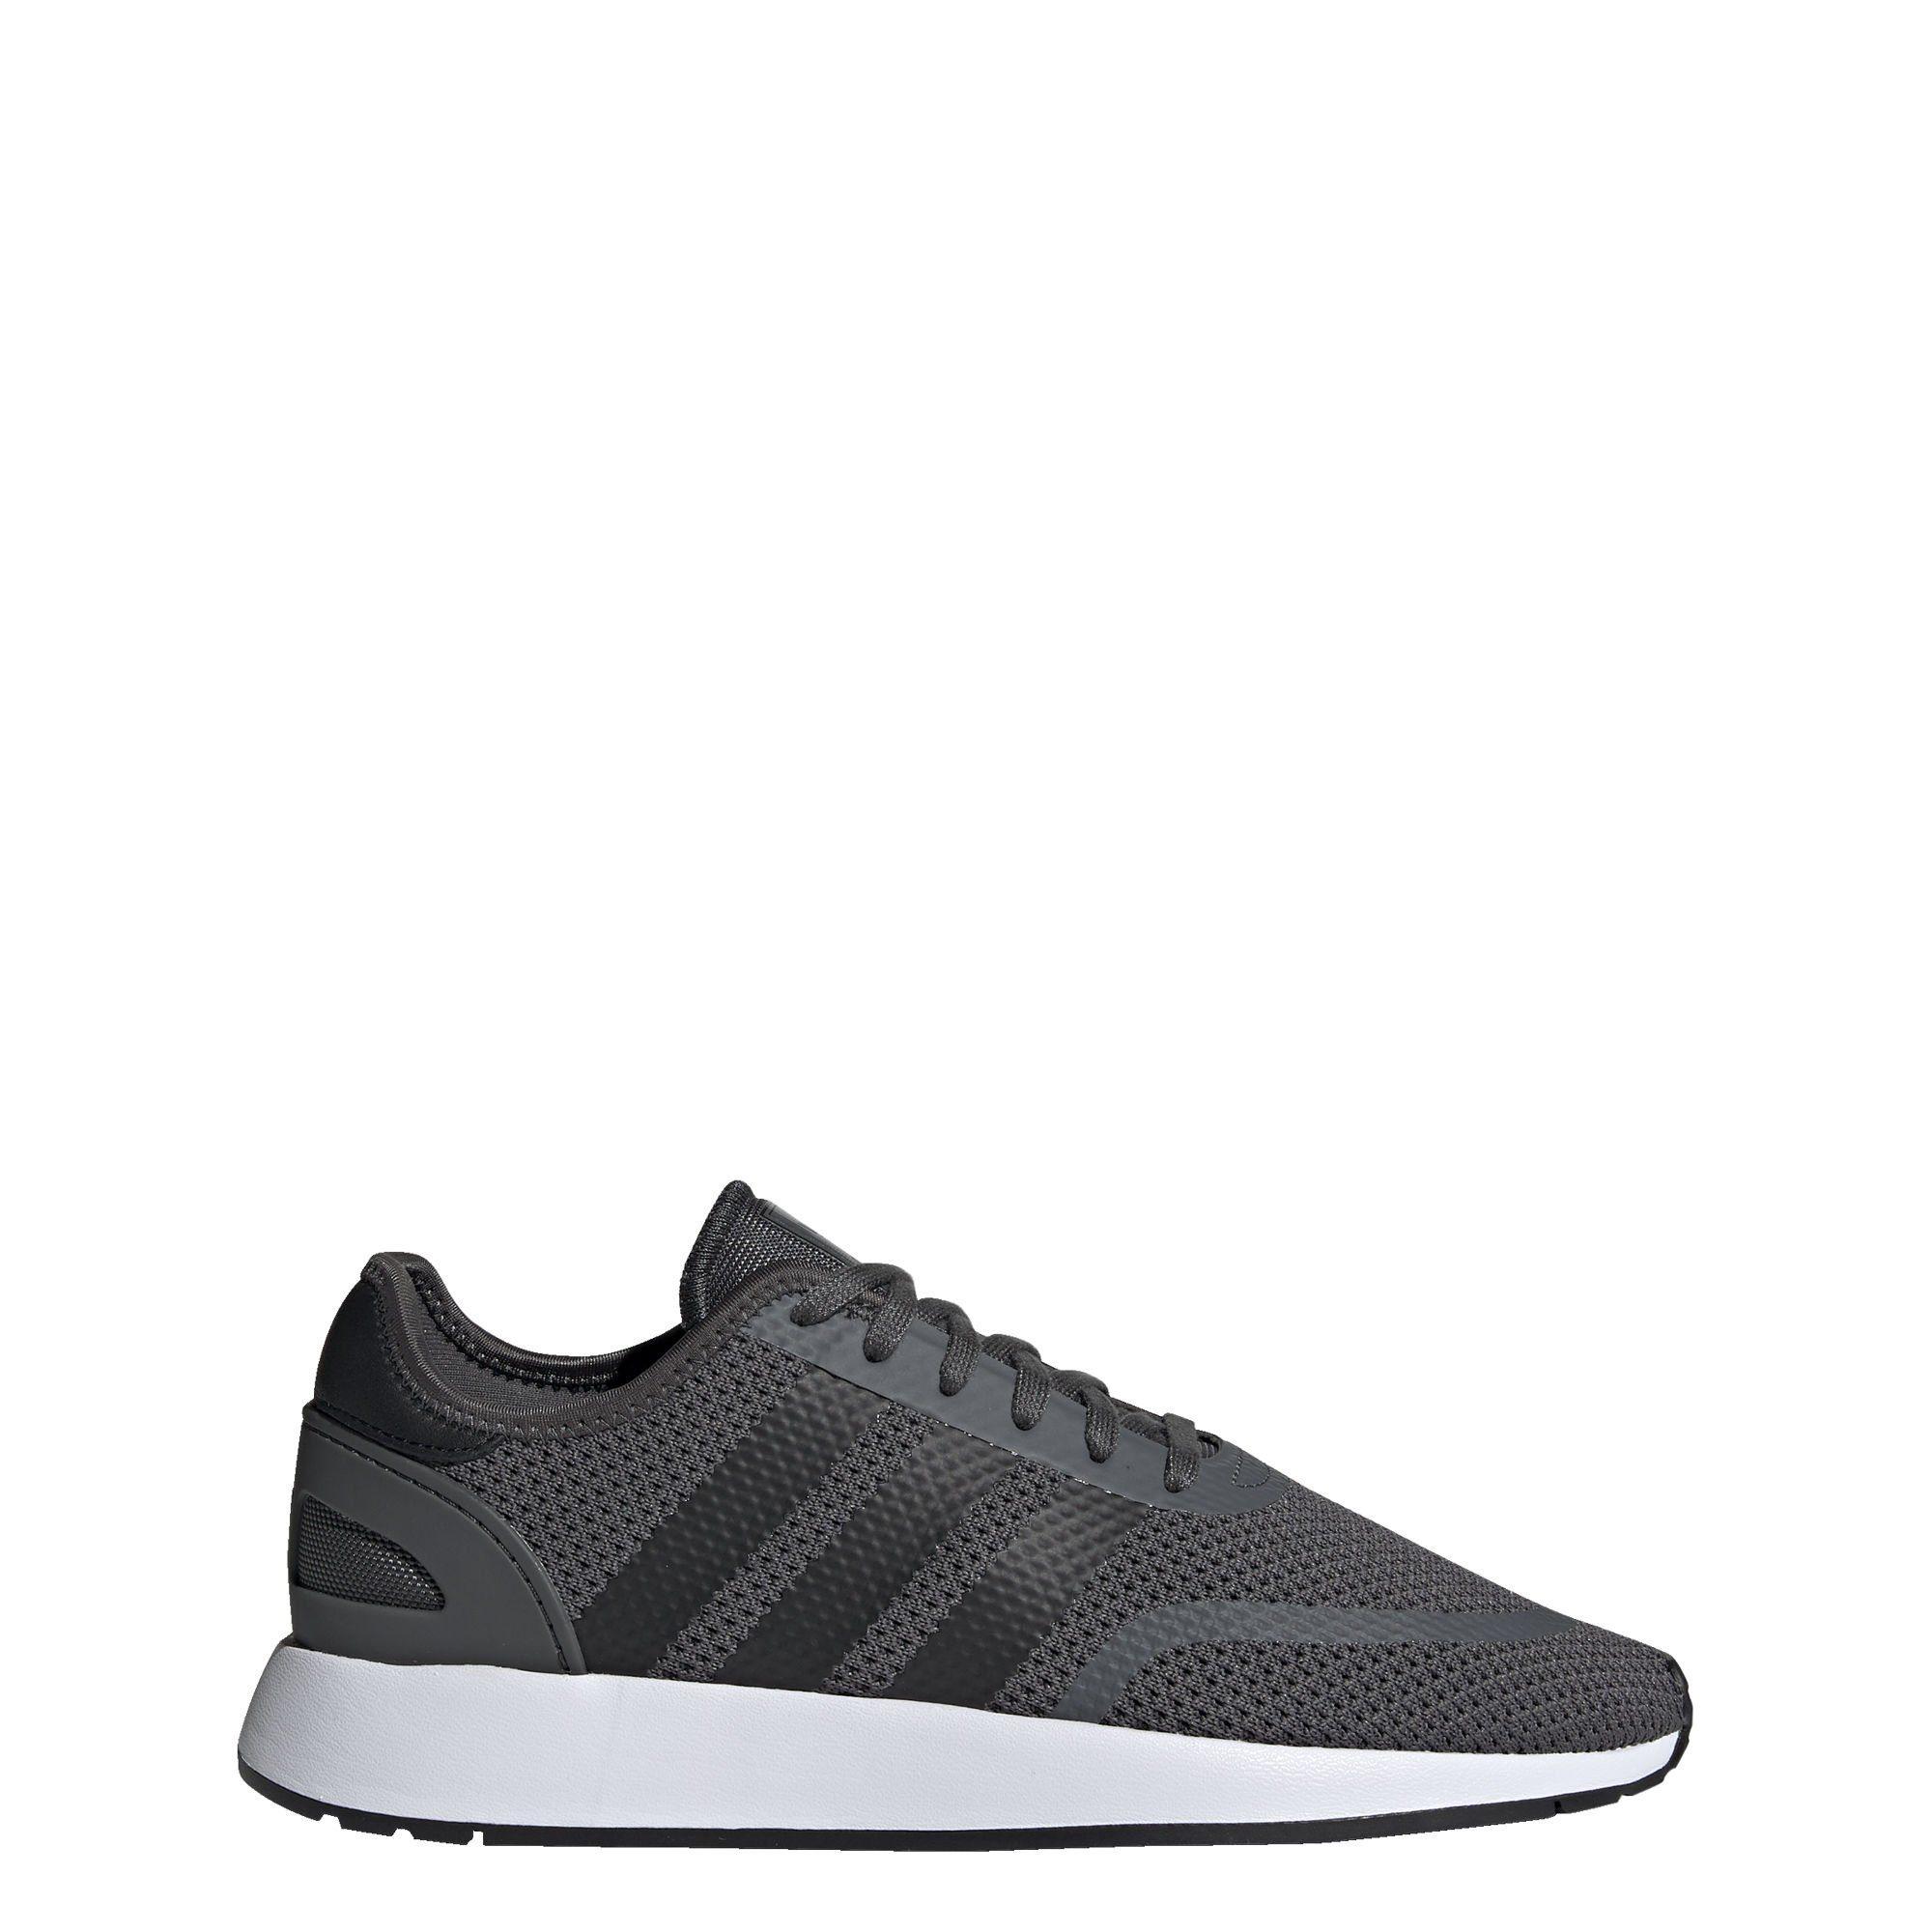 Schuh« Originals »n Adidas Sneaker NOtto 5923 8PXnOZN0wk